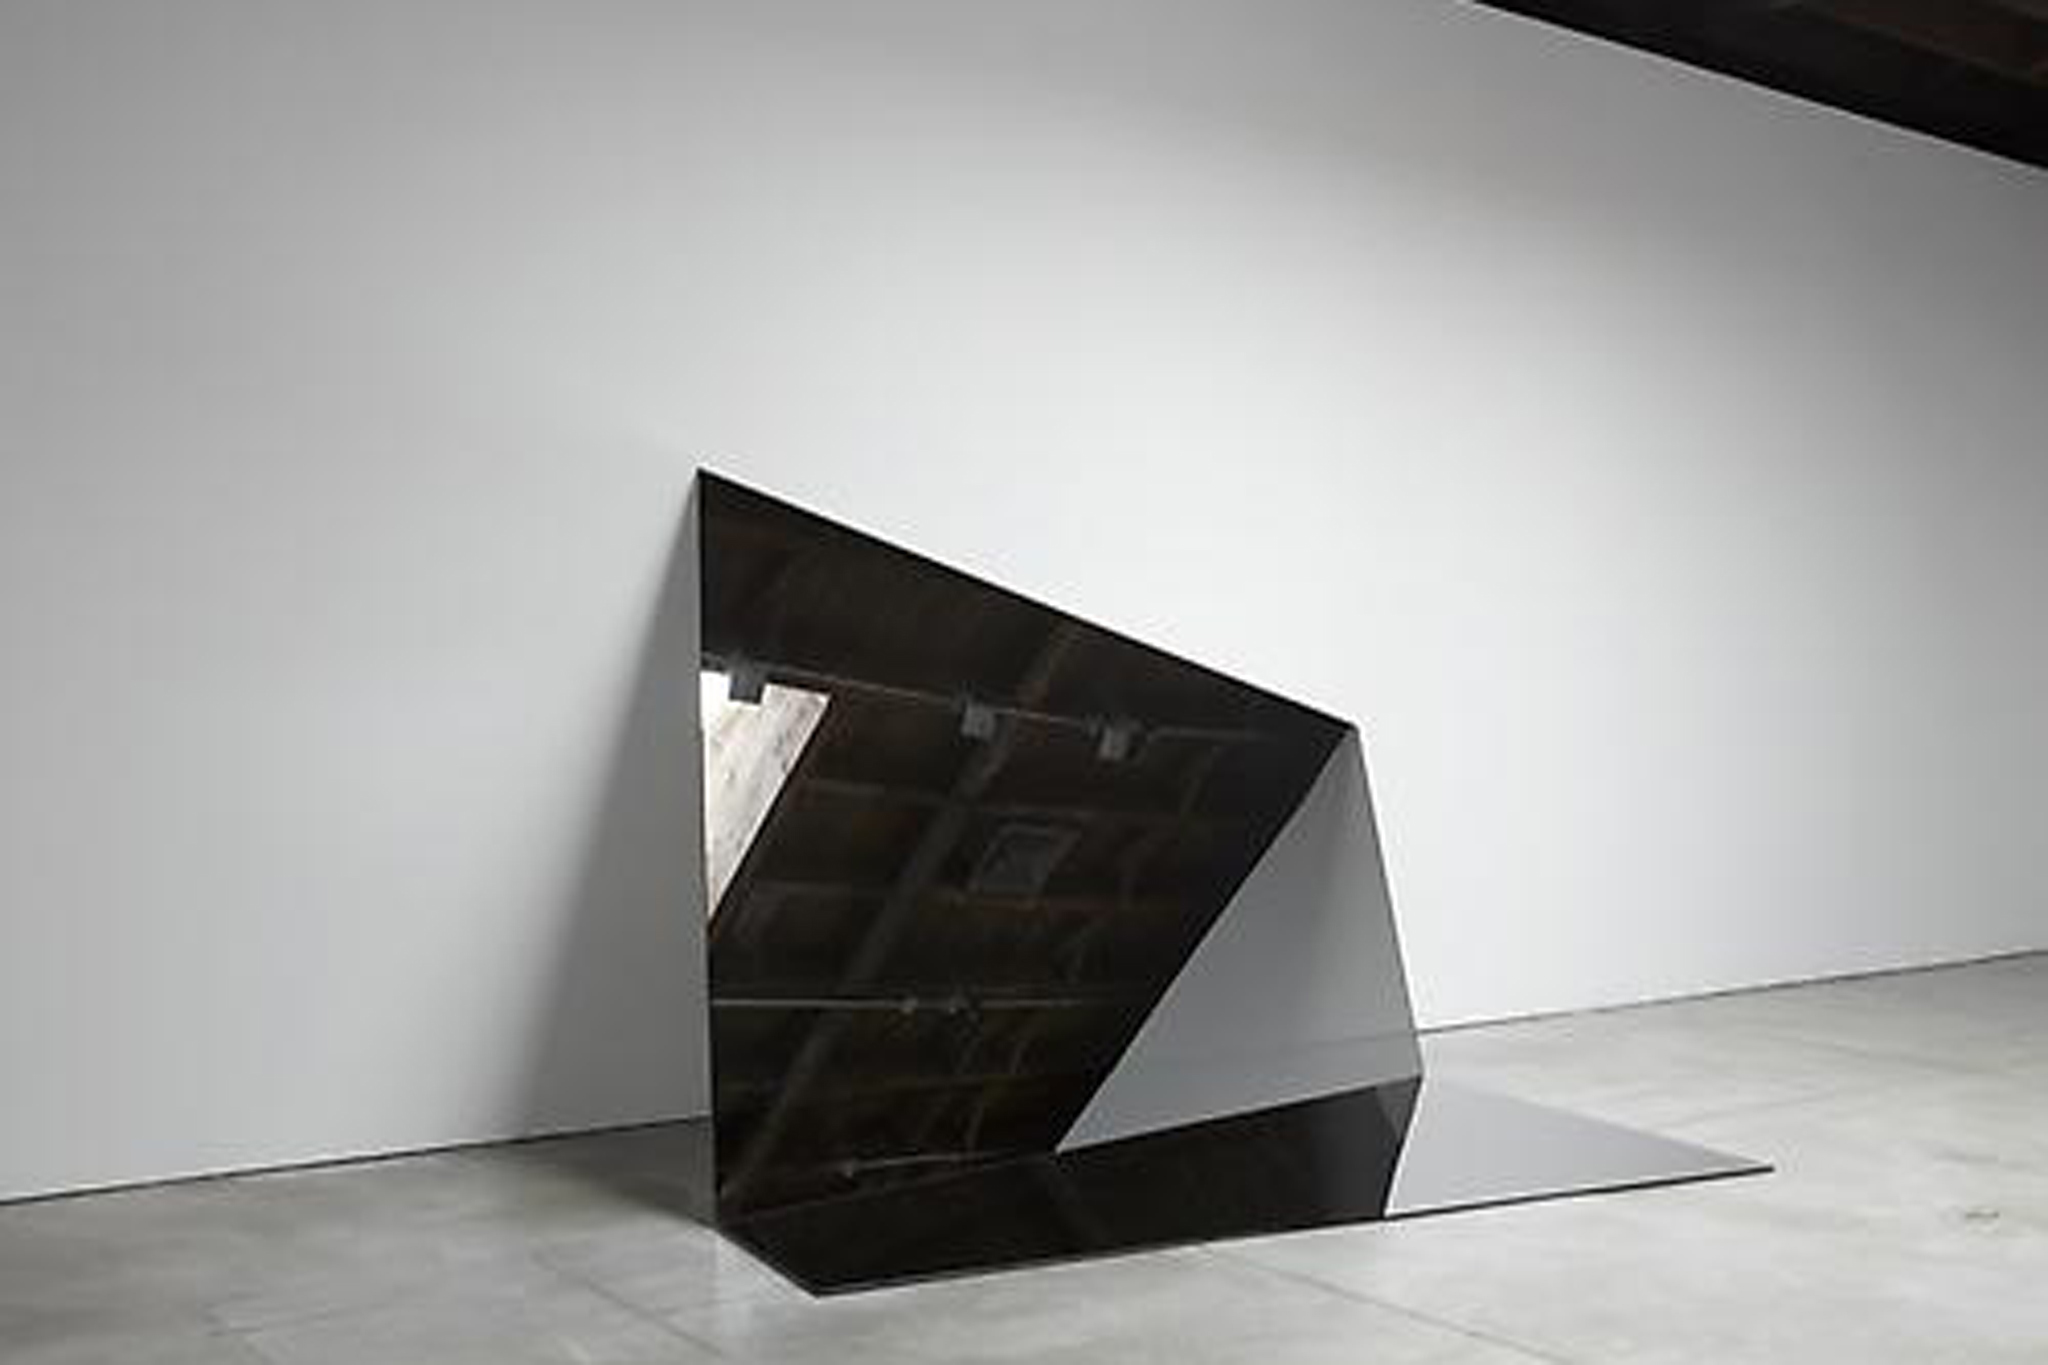 Iran do Espírito Santo, Untitled (Folded Mirror 12), 2011